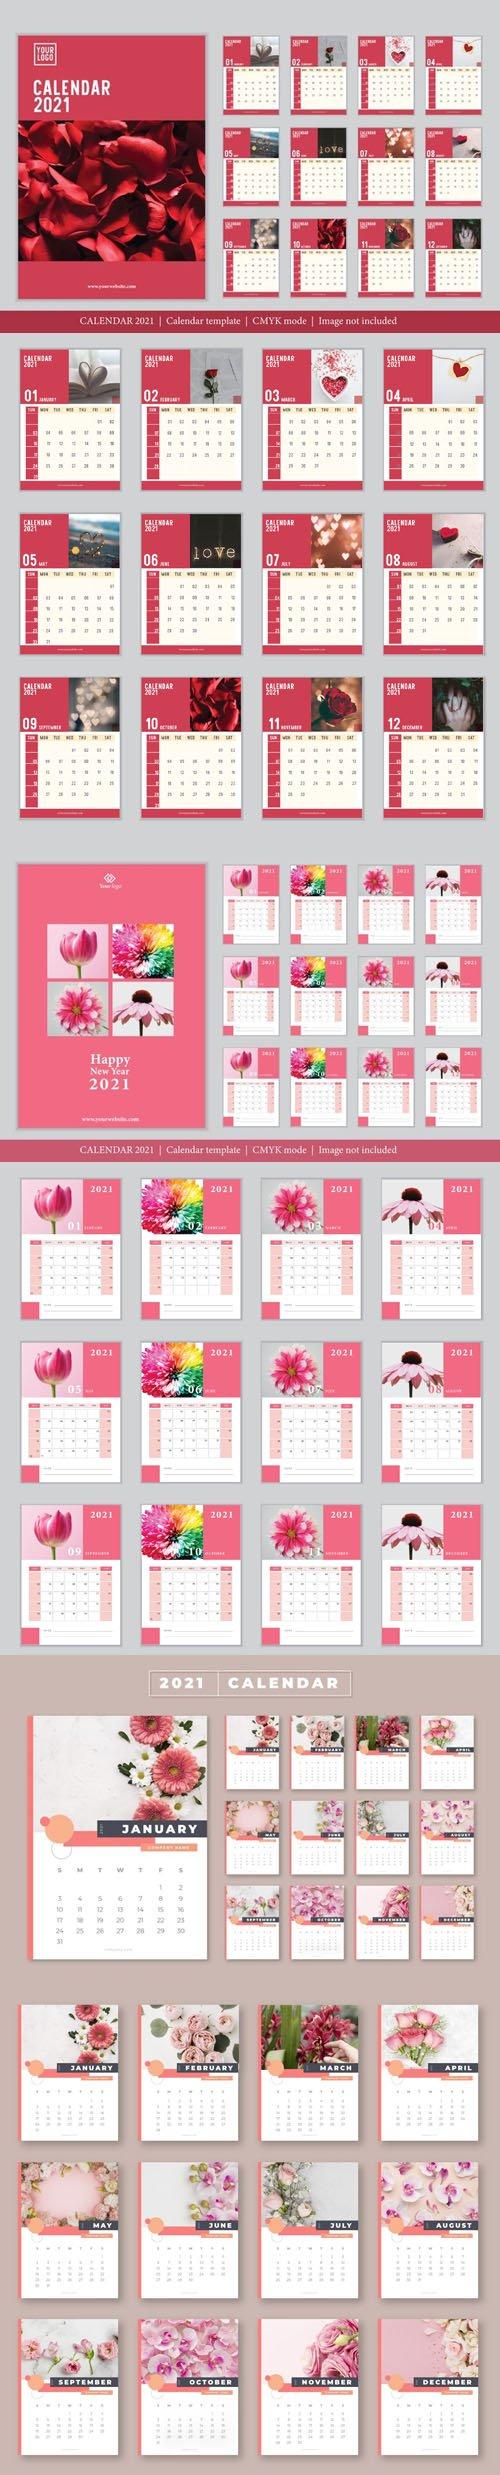 3 Vector Calendars 2021 in Romantic & Rosy Styles